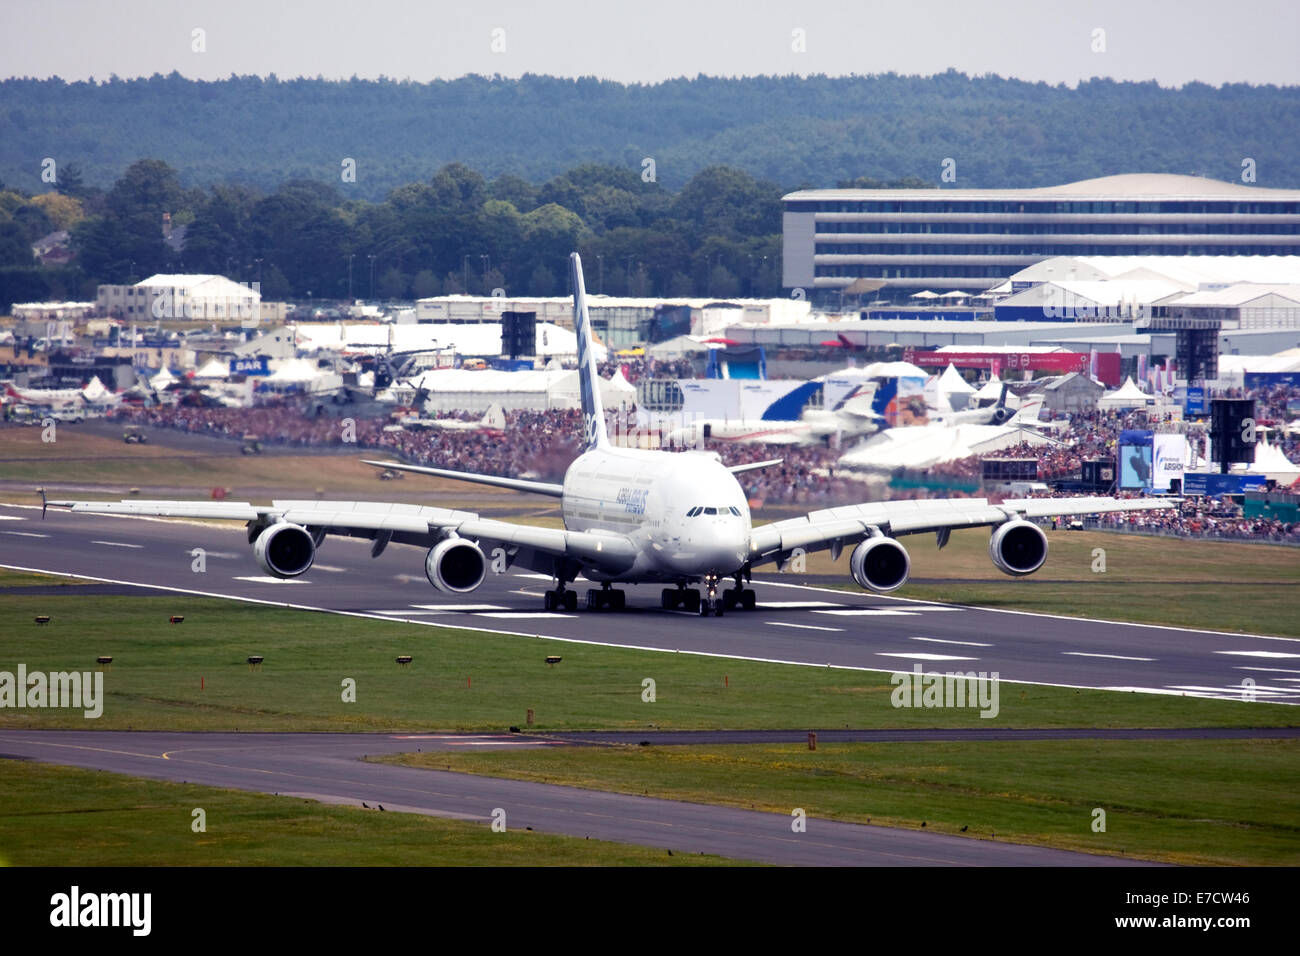 Airbus A380-841 at Farnborough International Airshow 2014 - Stock Image